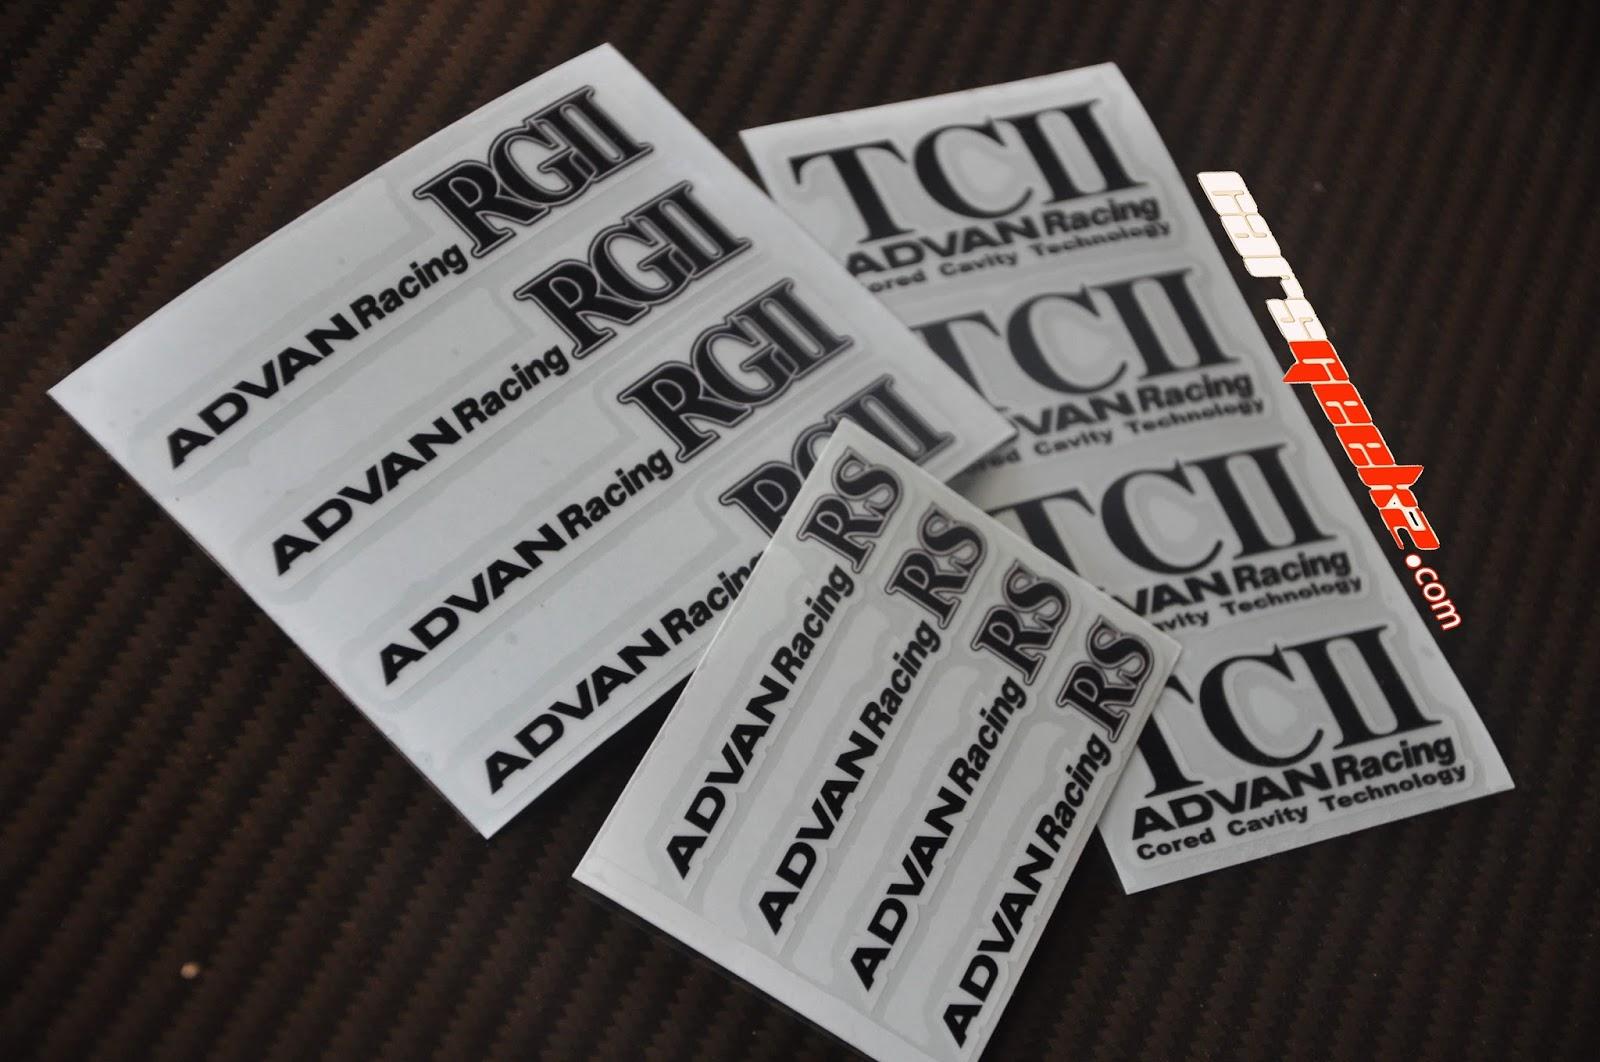 Advan Racing RS vinyl RSD